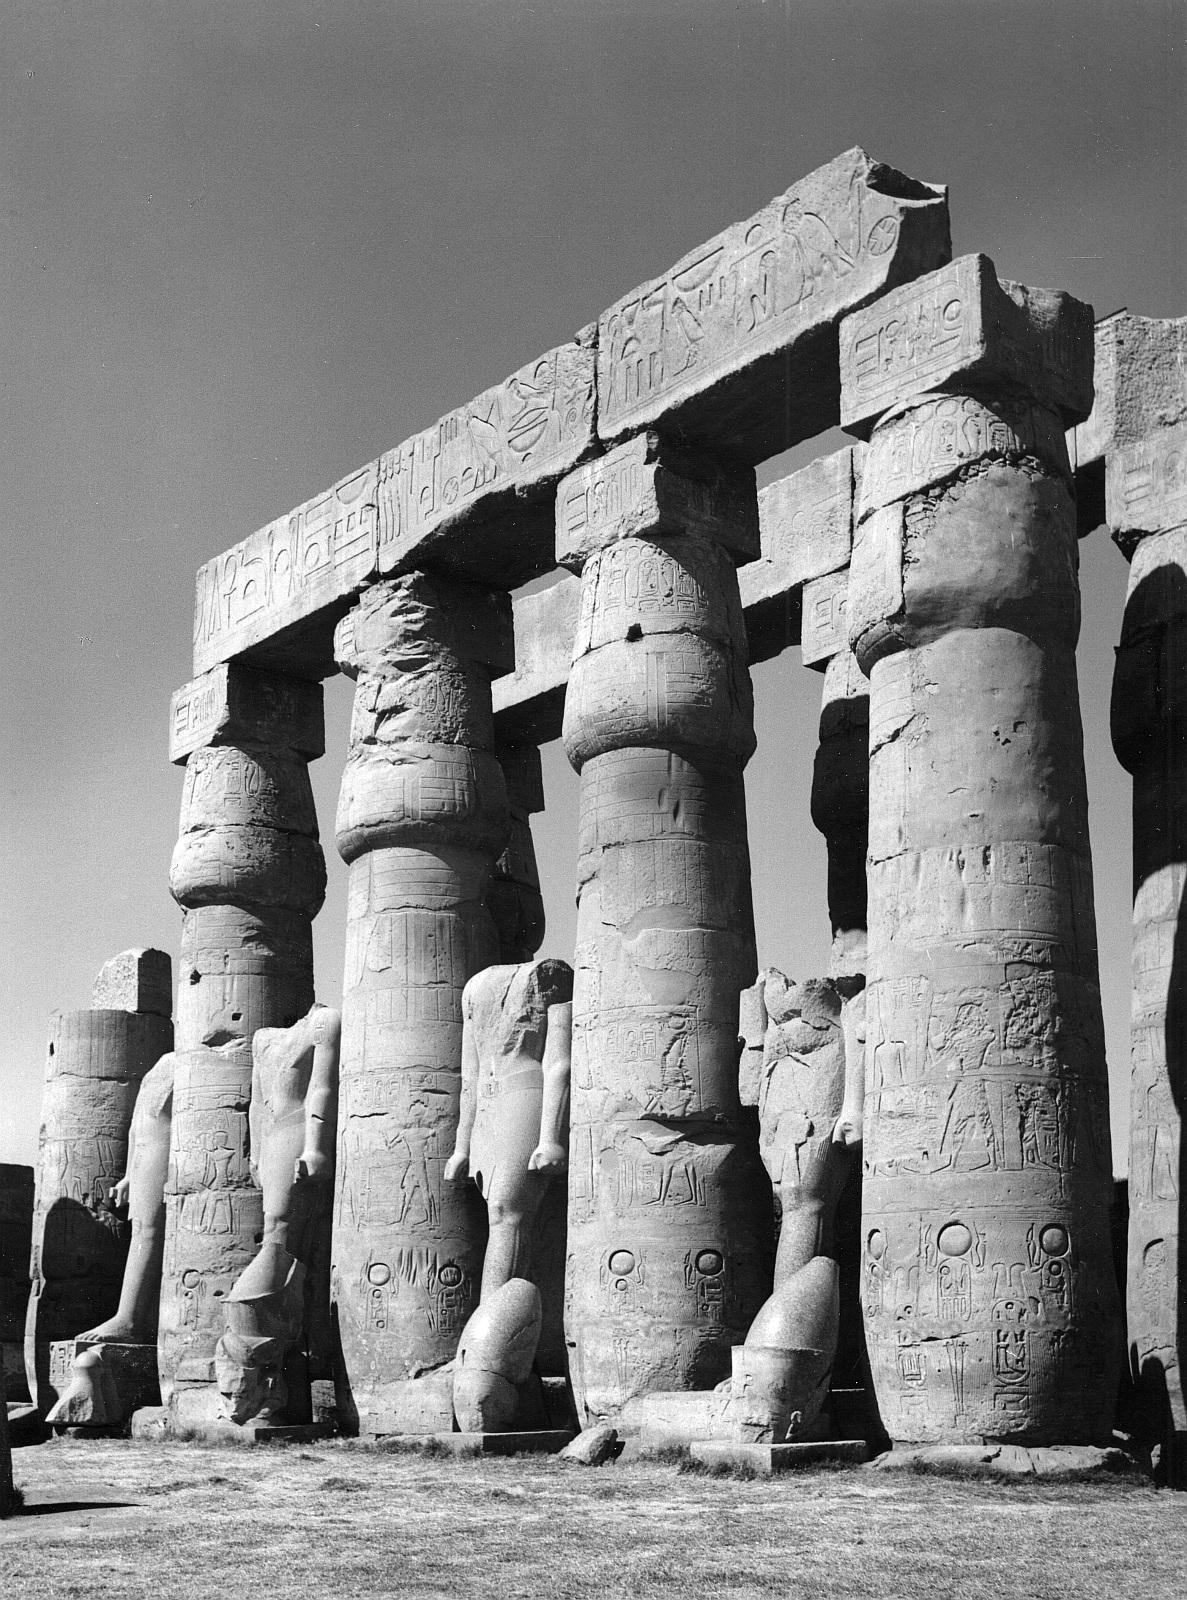 Луксор. Двор Рамзеса II. Северо-западная сторона